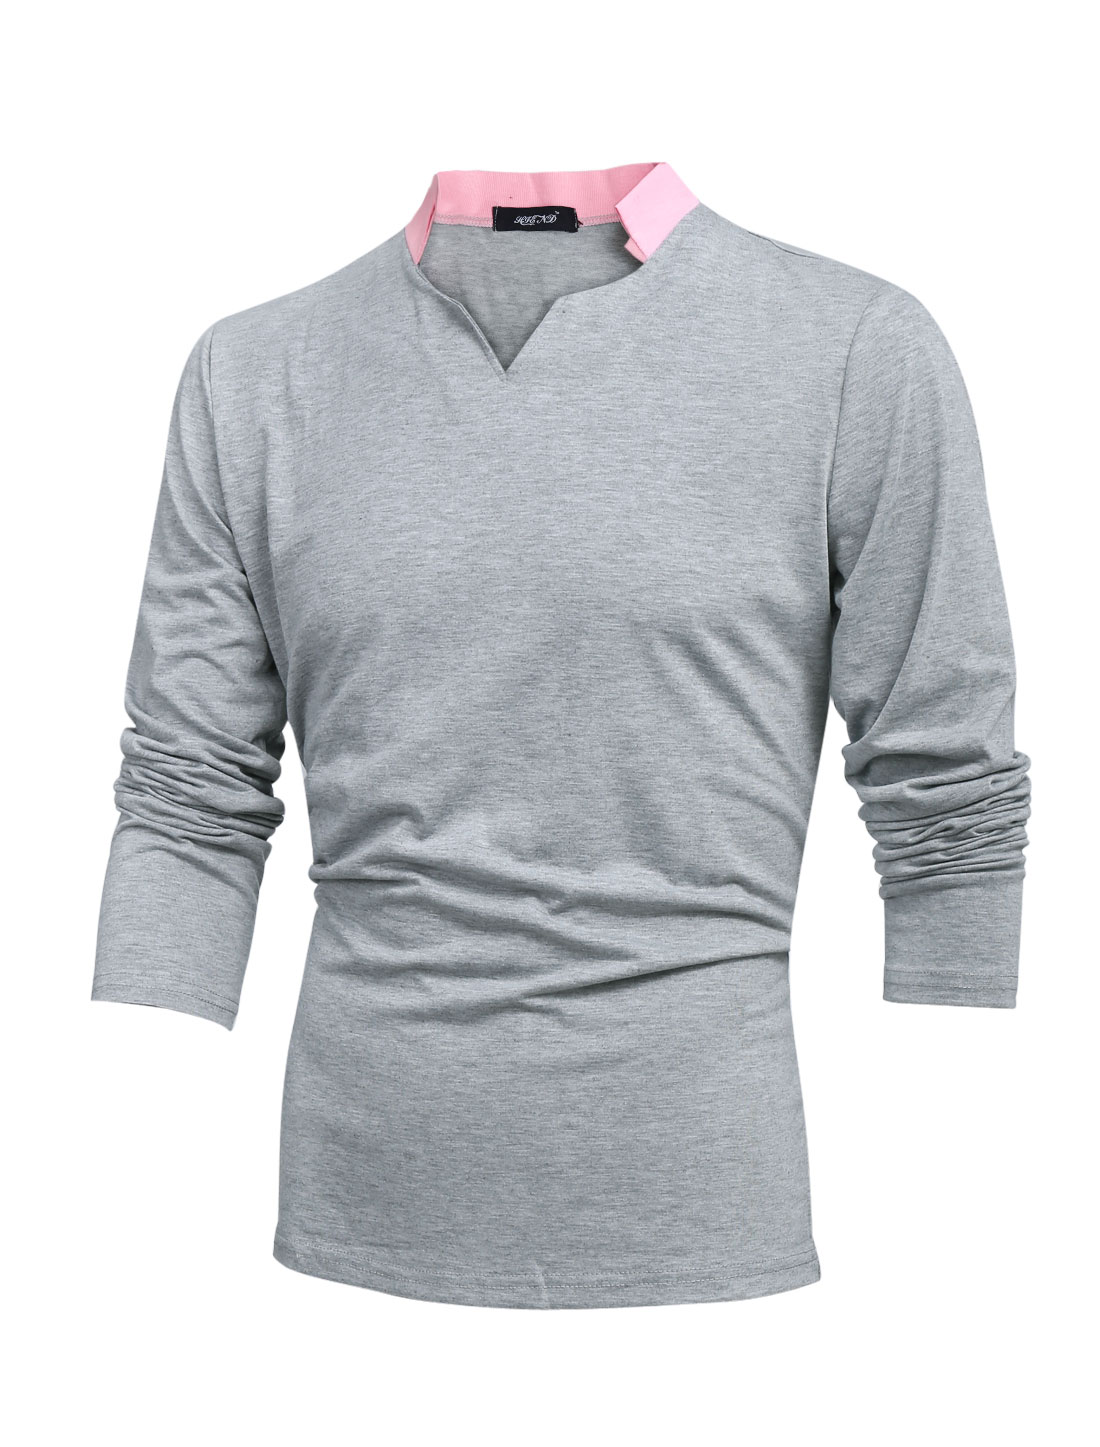 Men Color Block Notch Neck Long Sleeve Casual T-shirt Light Gray M